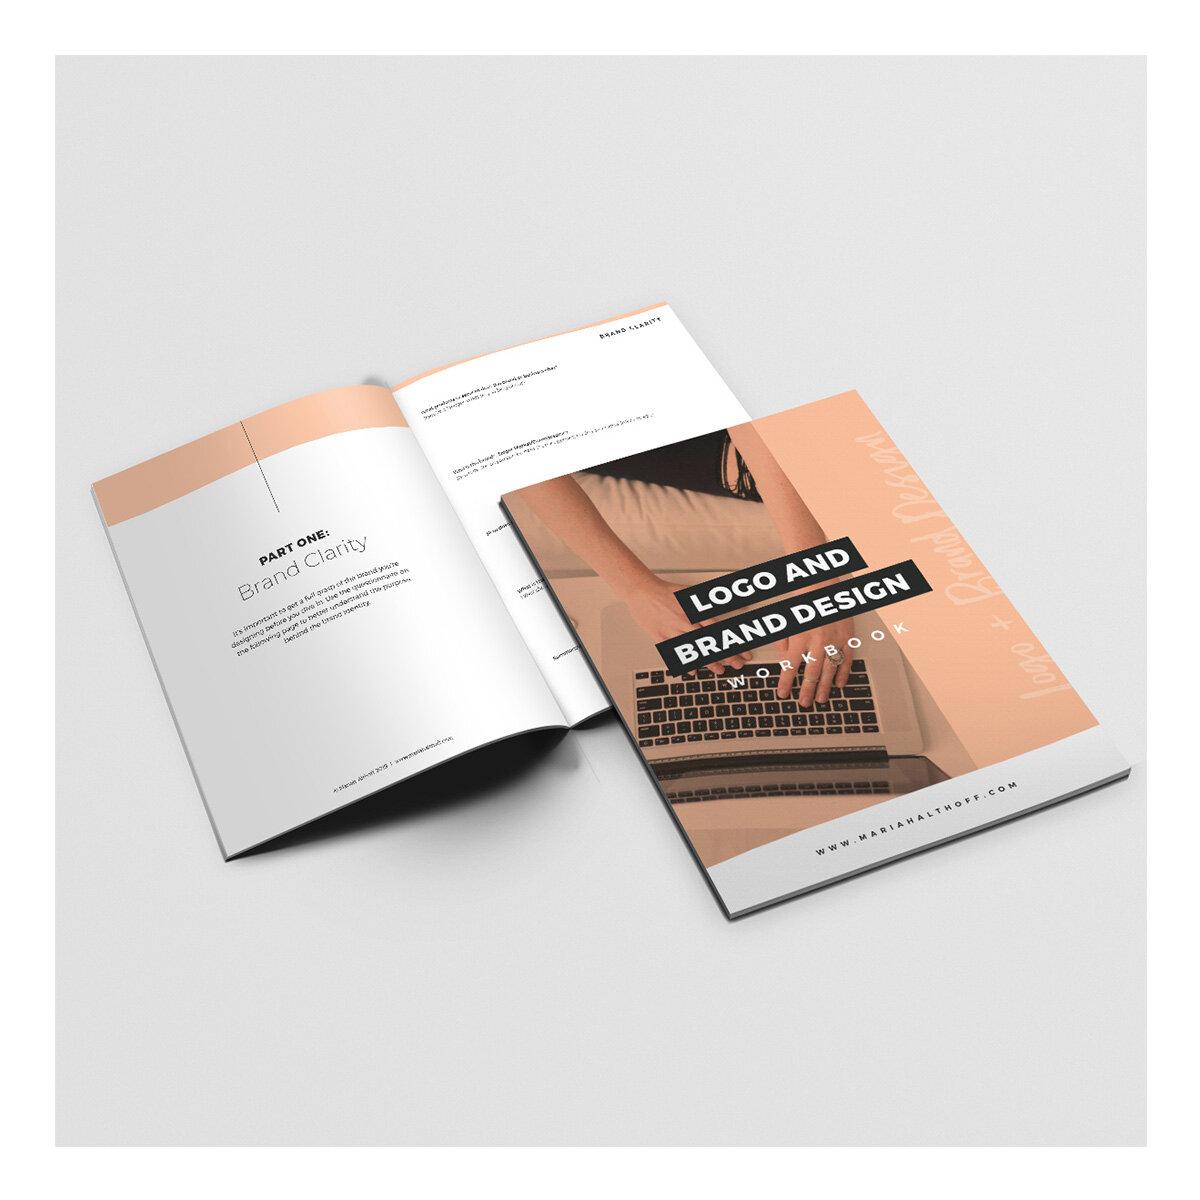 Logo And Brand Design Workbook Mariah Althoff Graphic Design Freelancing Tips